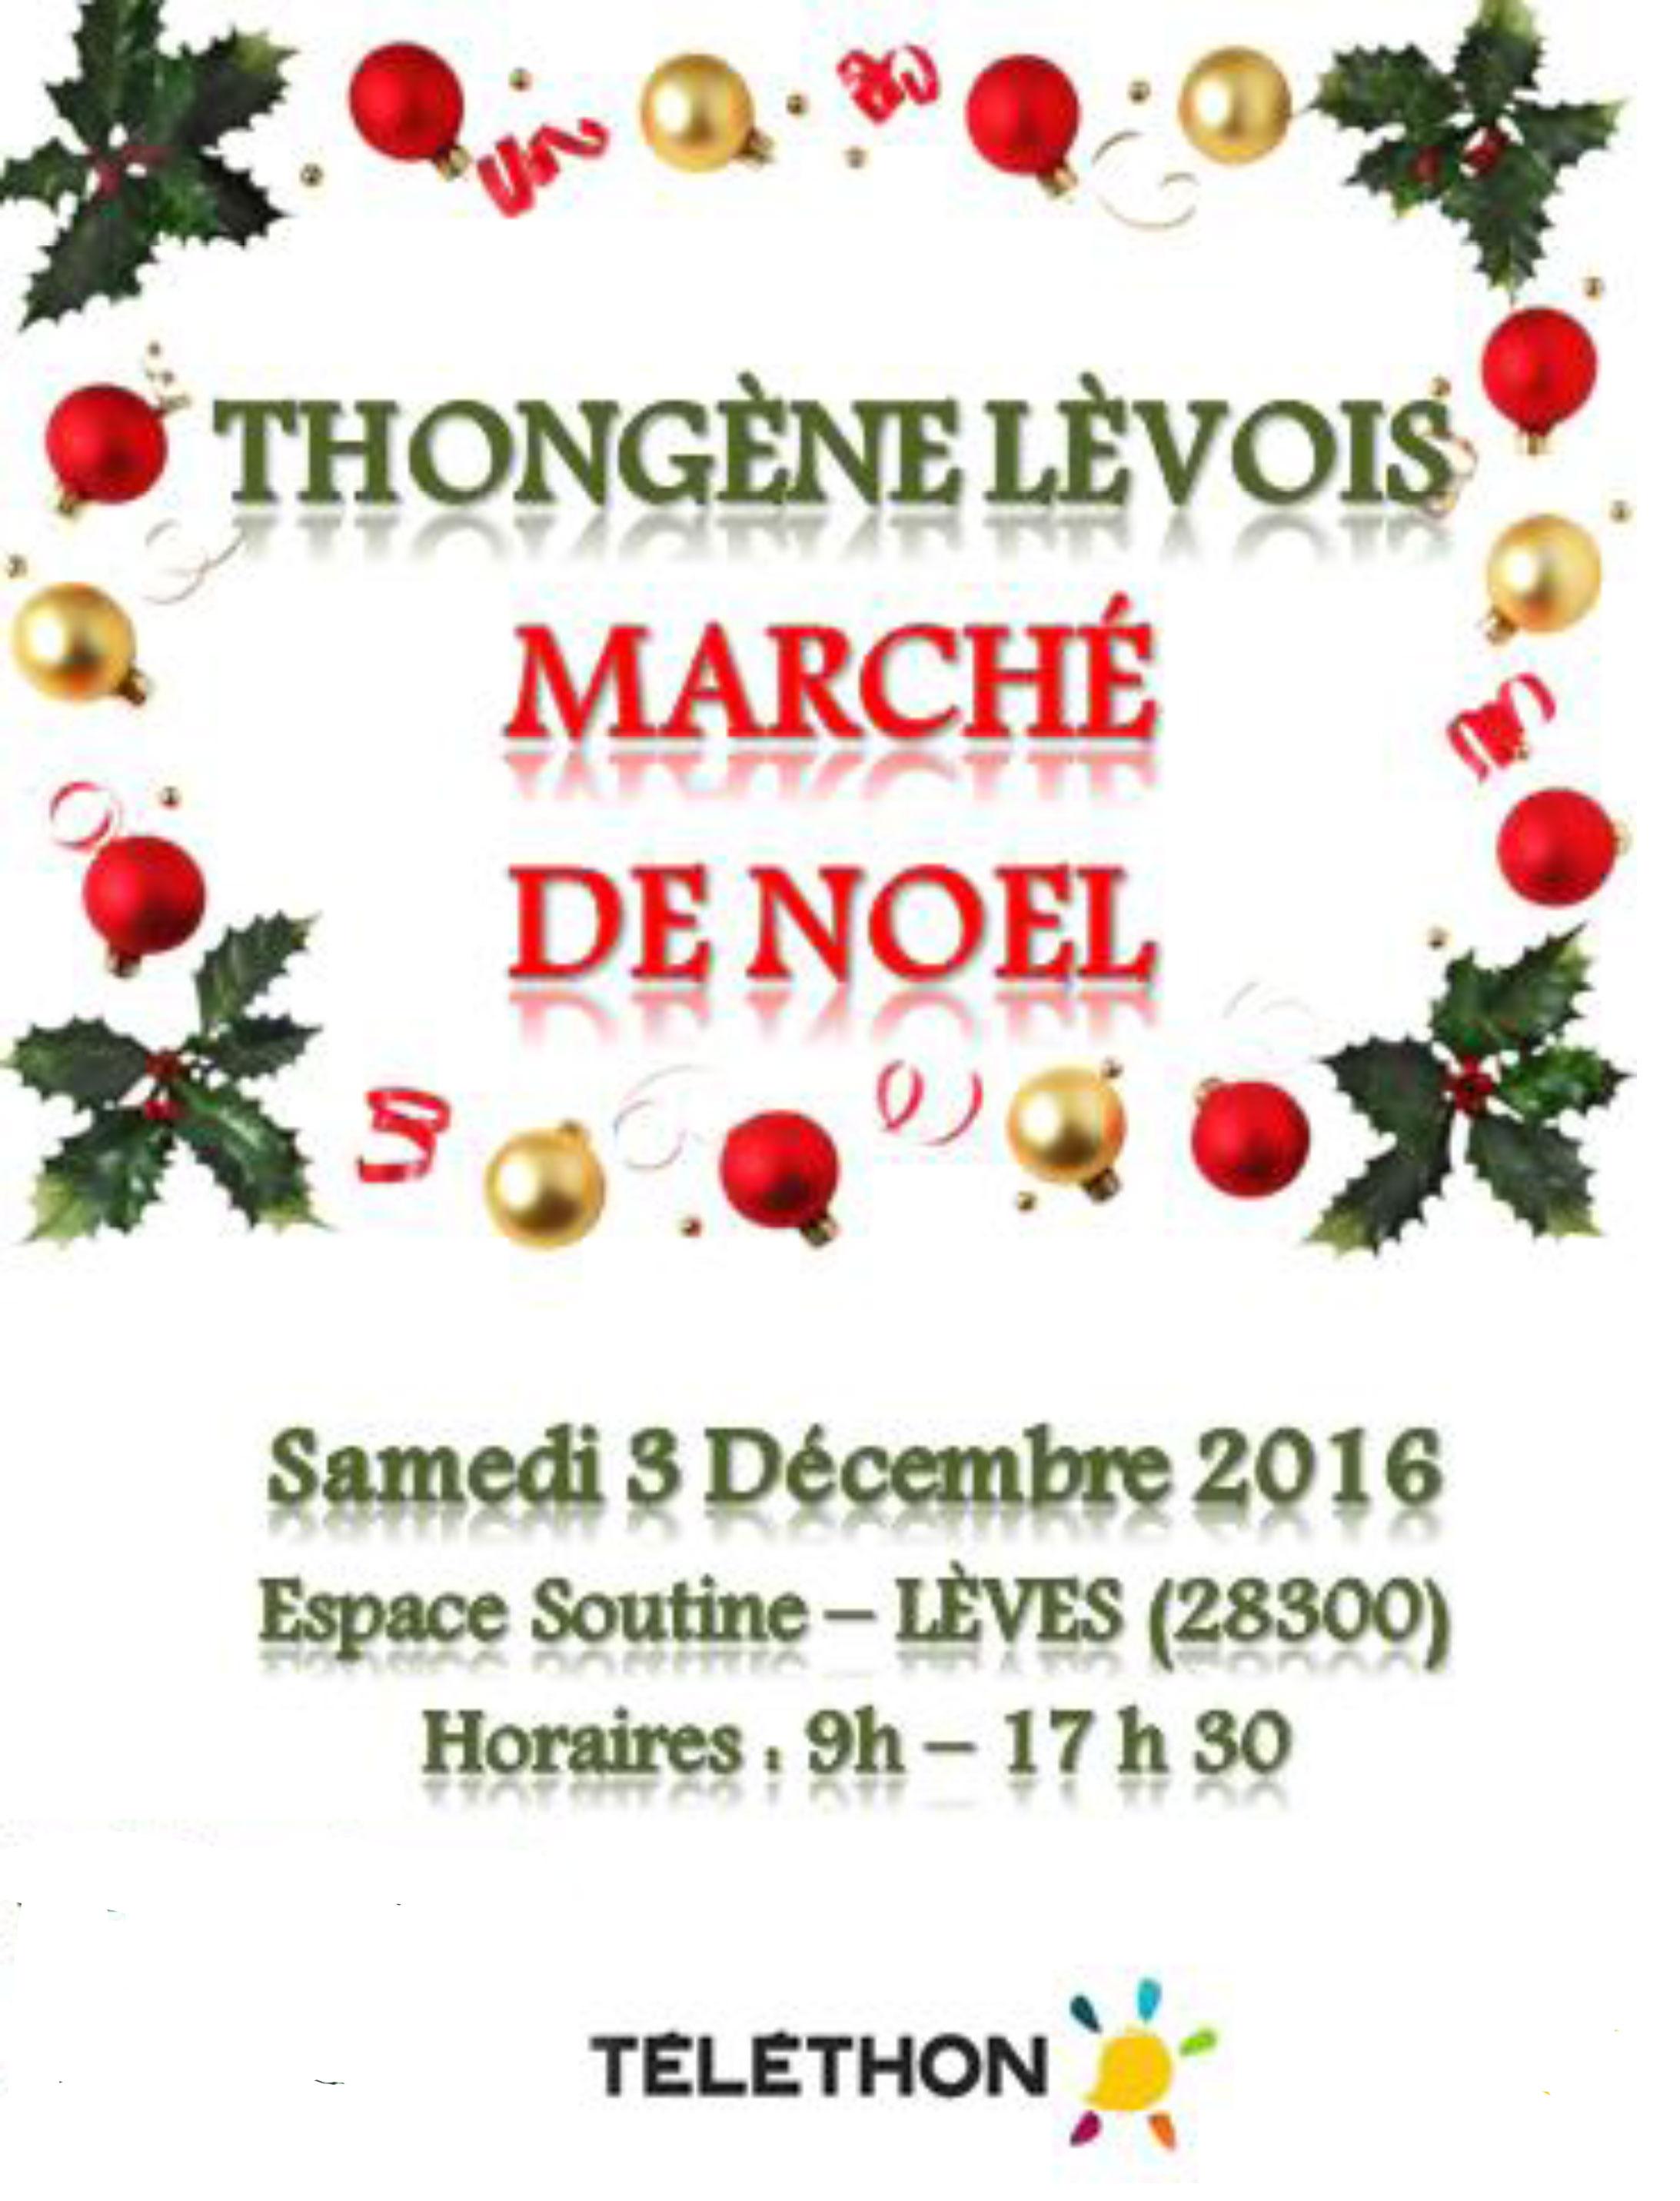 marche-noel-leves